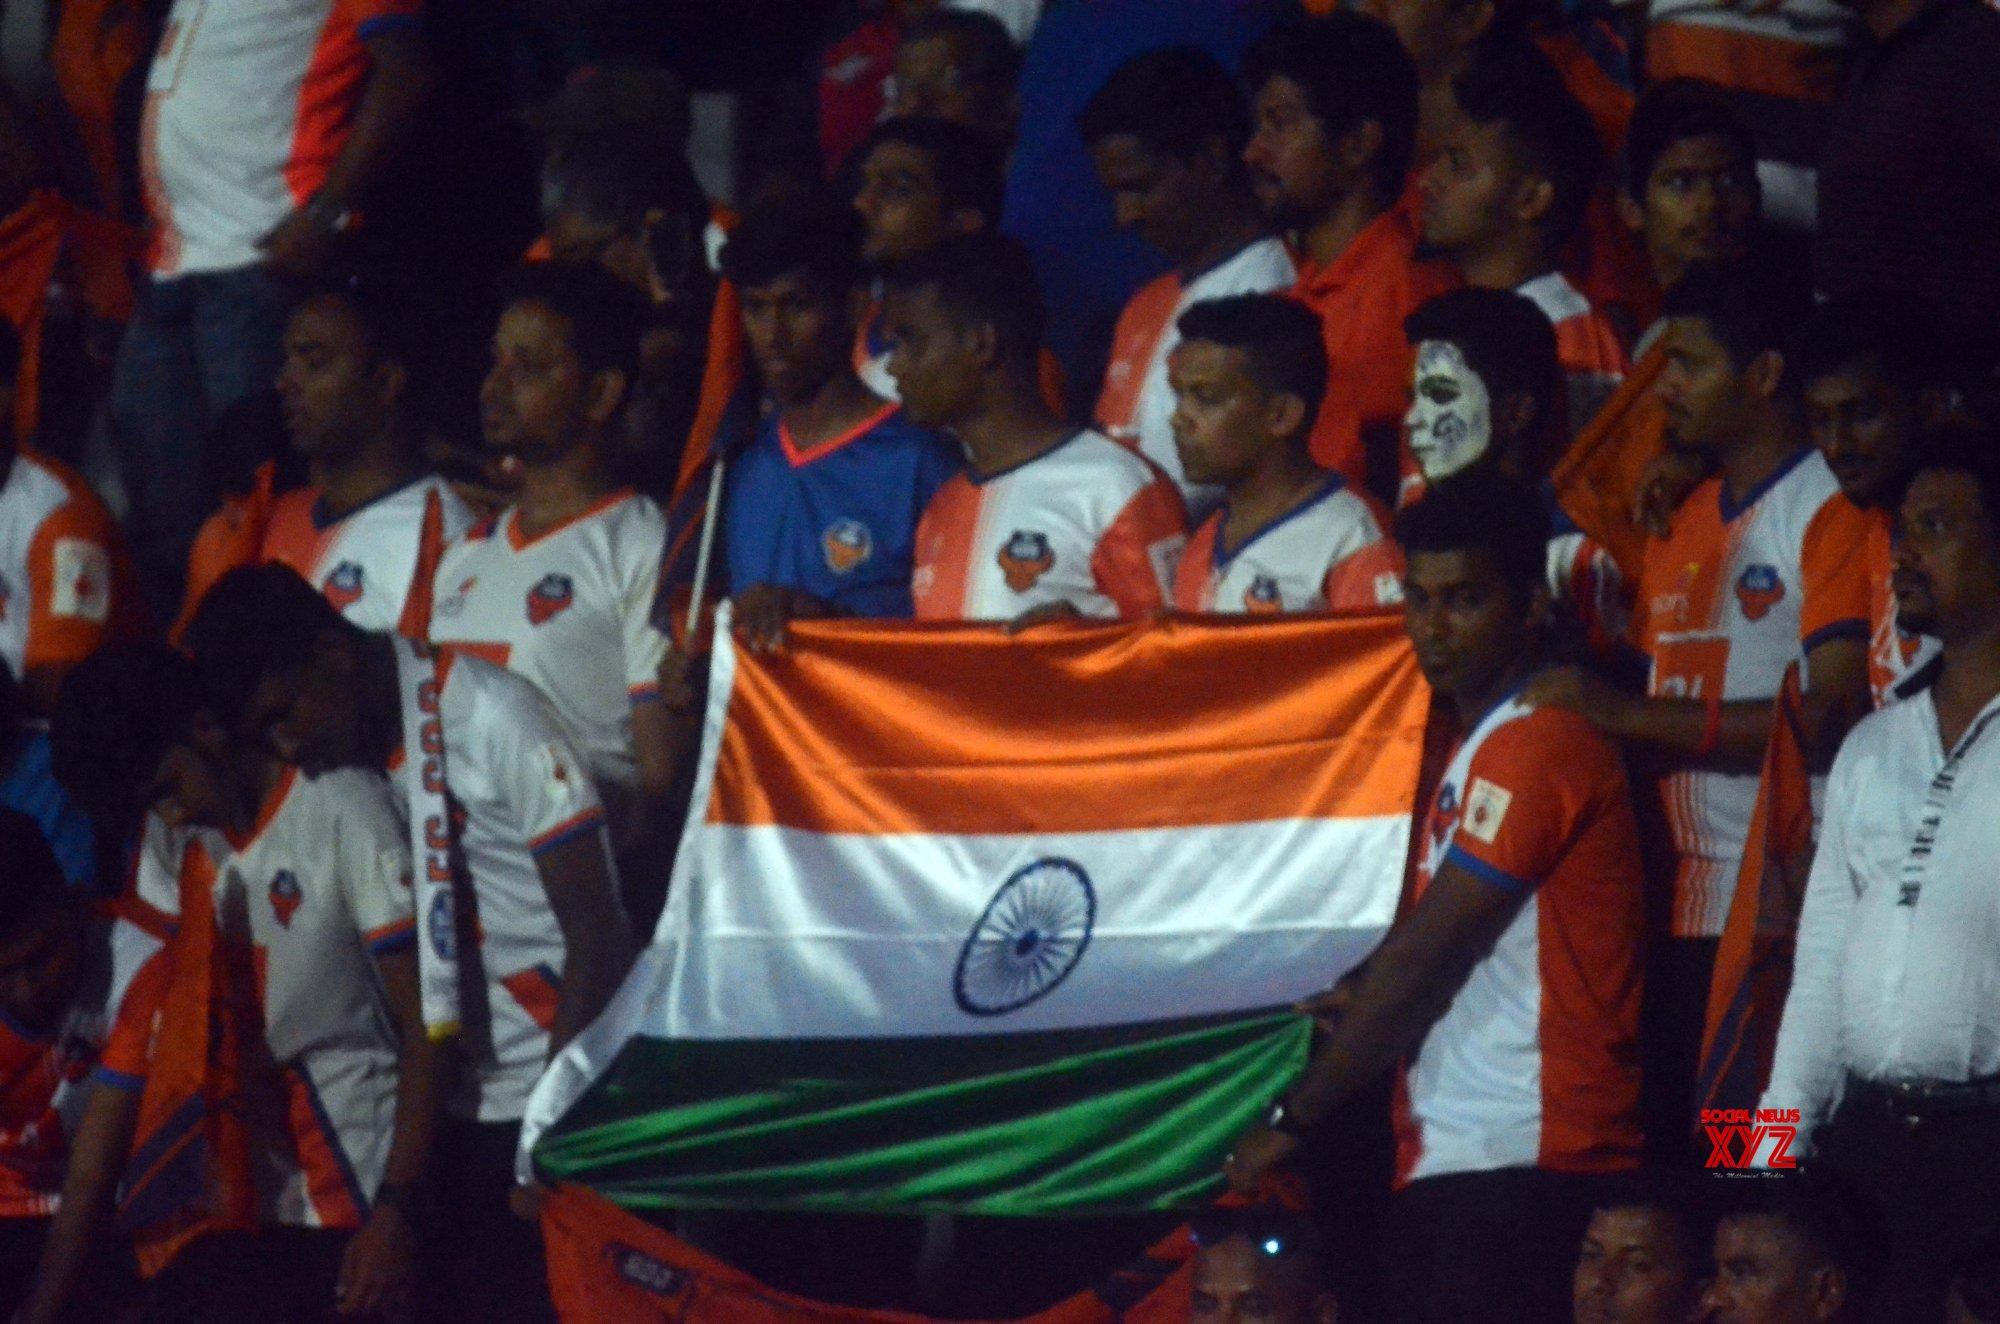 Mumbai: - ISL 2019 - Final - Bengaluru FC Vs FC Goa #Gallery